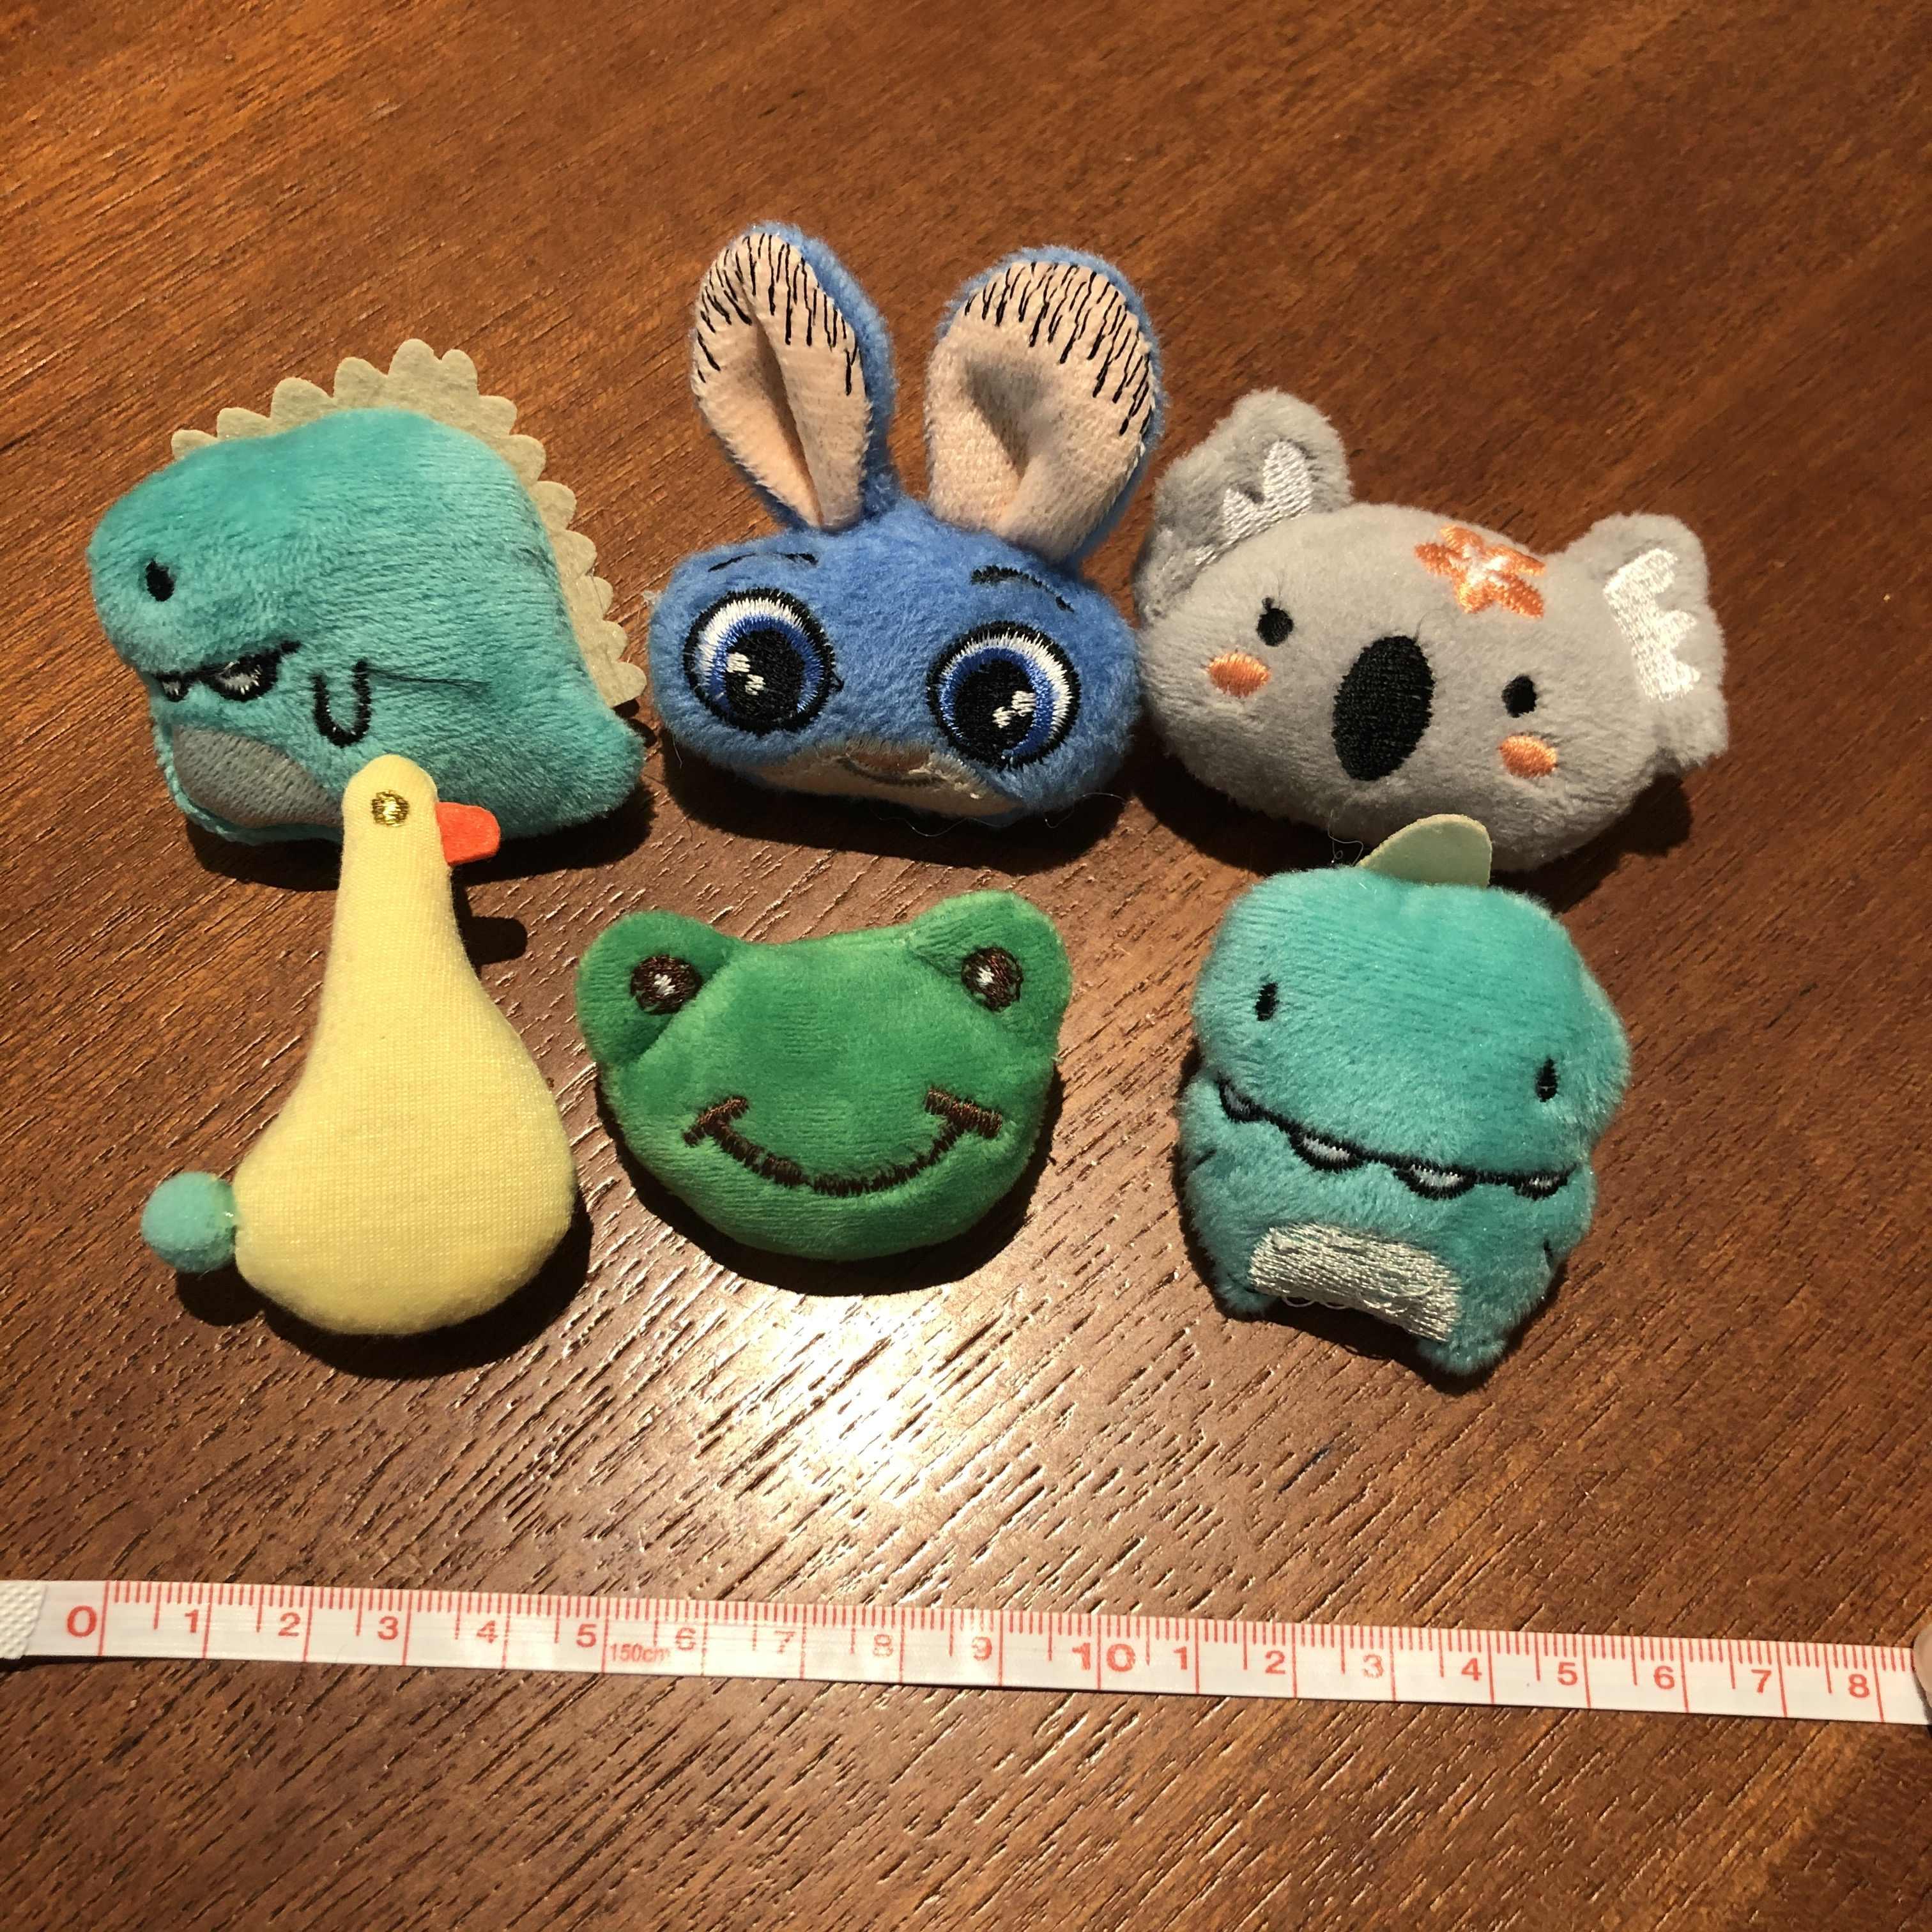 1PCS 새로운 디자인 만화 동물 인형 브로치 스티치 피카추 포케몬 배지 호빵맨 세서미 스트리트 장난감 핀 장식 가방 옷